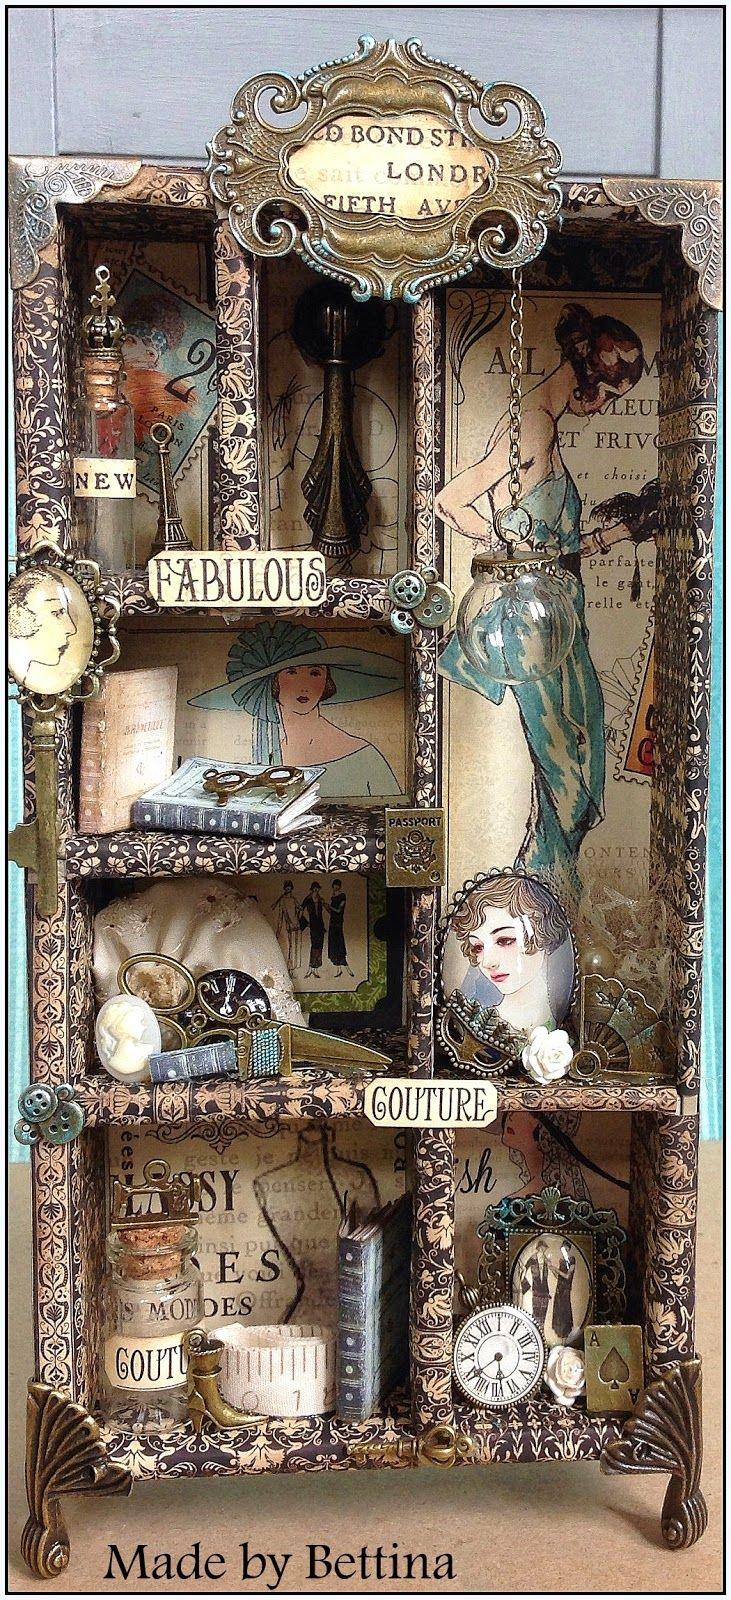 Letterbak - Wandbord - Vitrinekast *Shadow Box - Configuration Box ~Thema: Mode / Haute Couture~